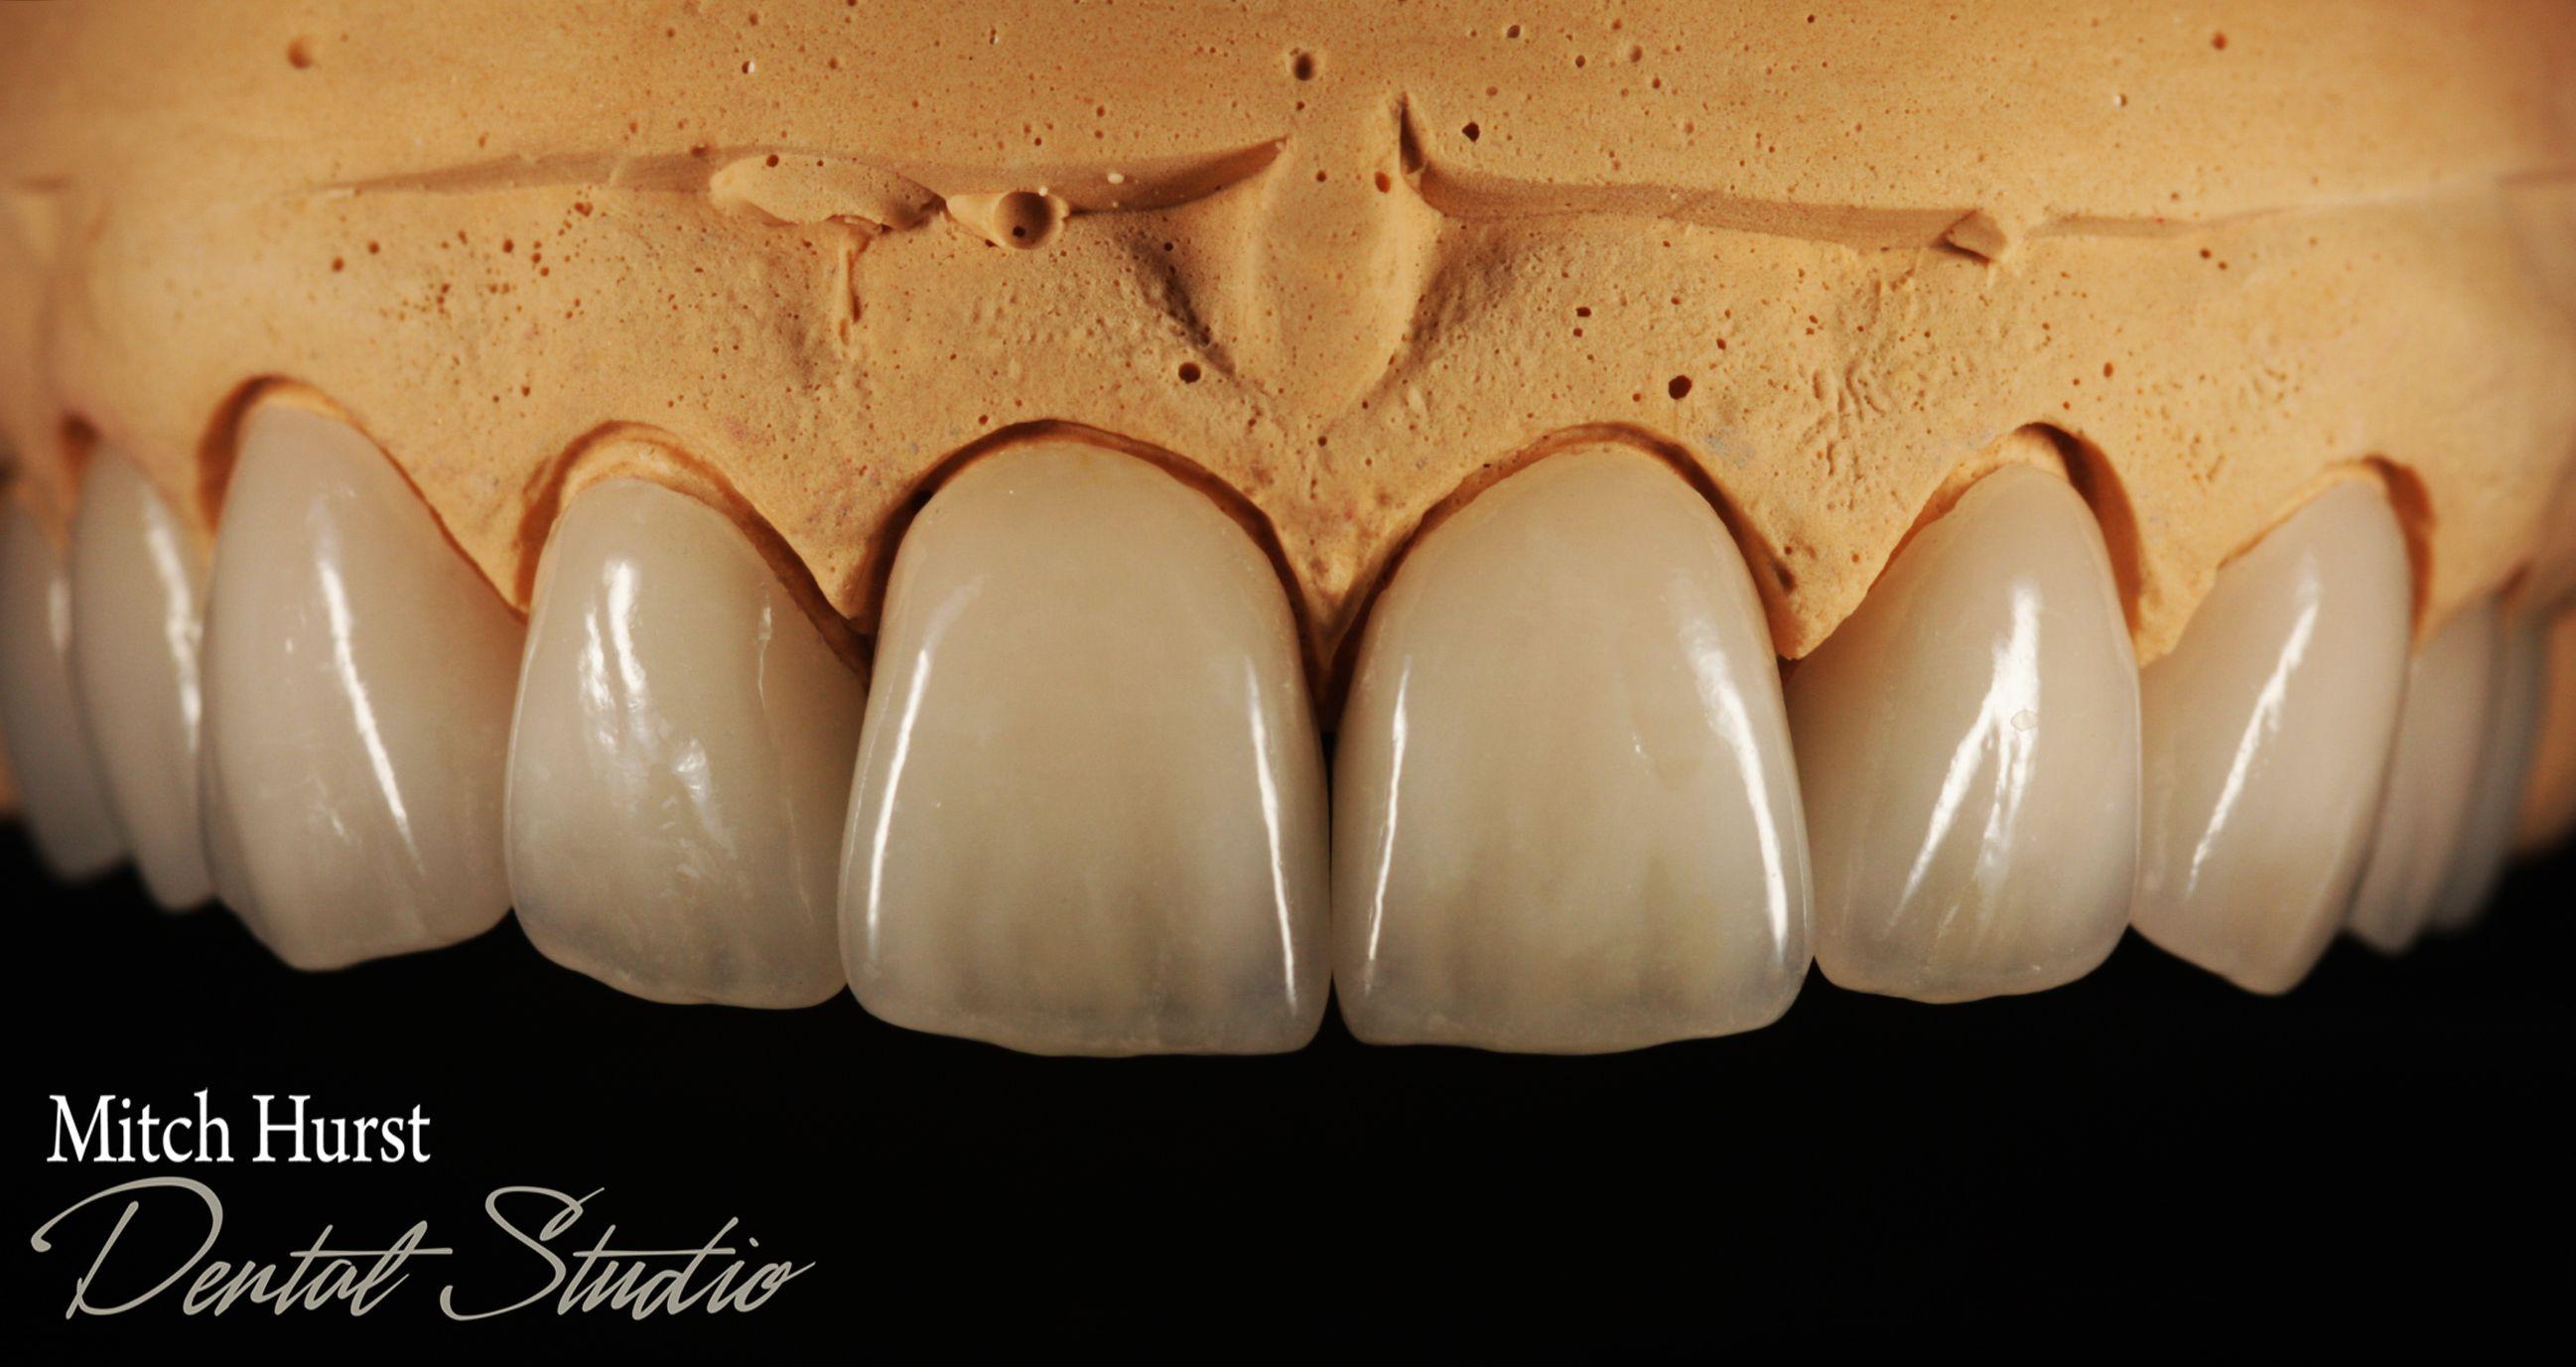 Dental Crowns Smile Aesthetic Beauty Hurstdentalstudio Com Dental Dental Images Dental Lab